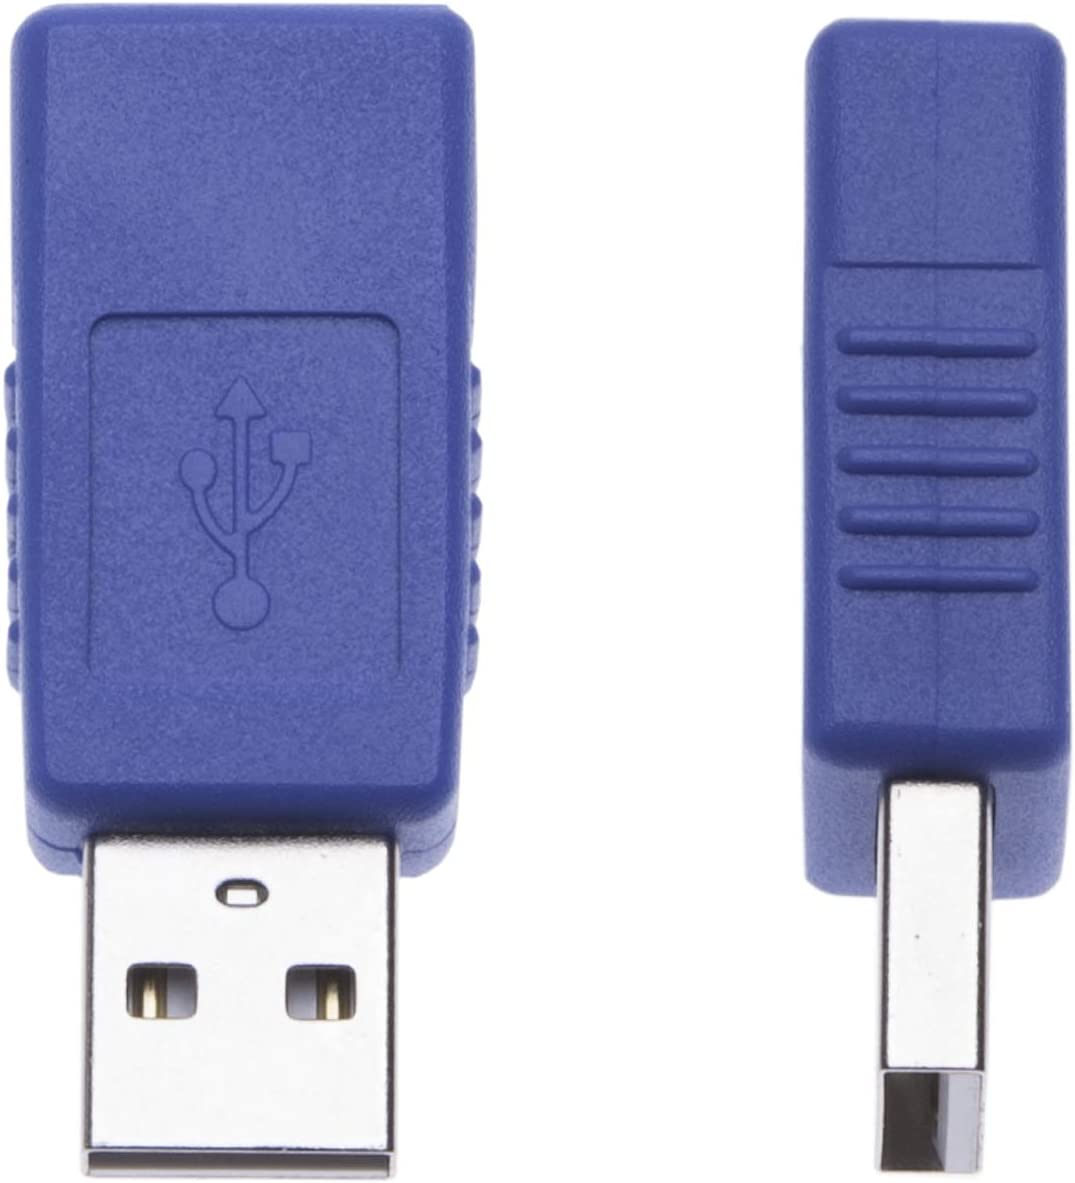 Keple 2 Pezzi Adattatore Maschio-Femmina Da USB 2.0 USB A Plug Gender Changer